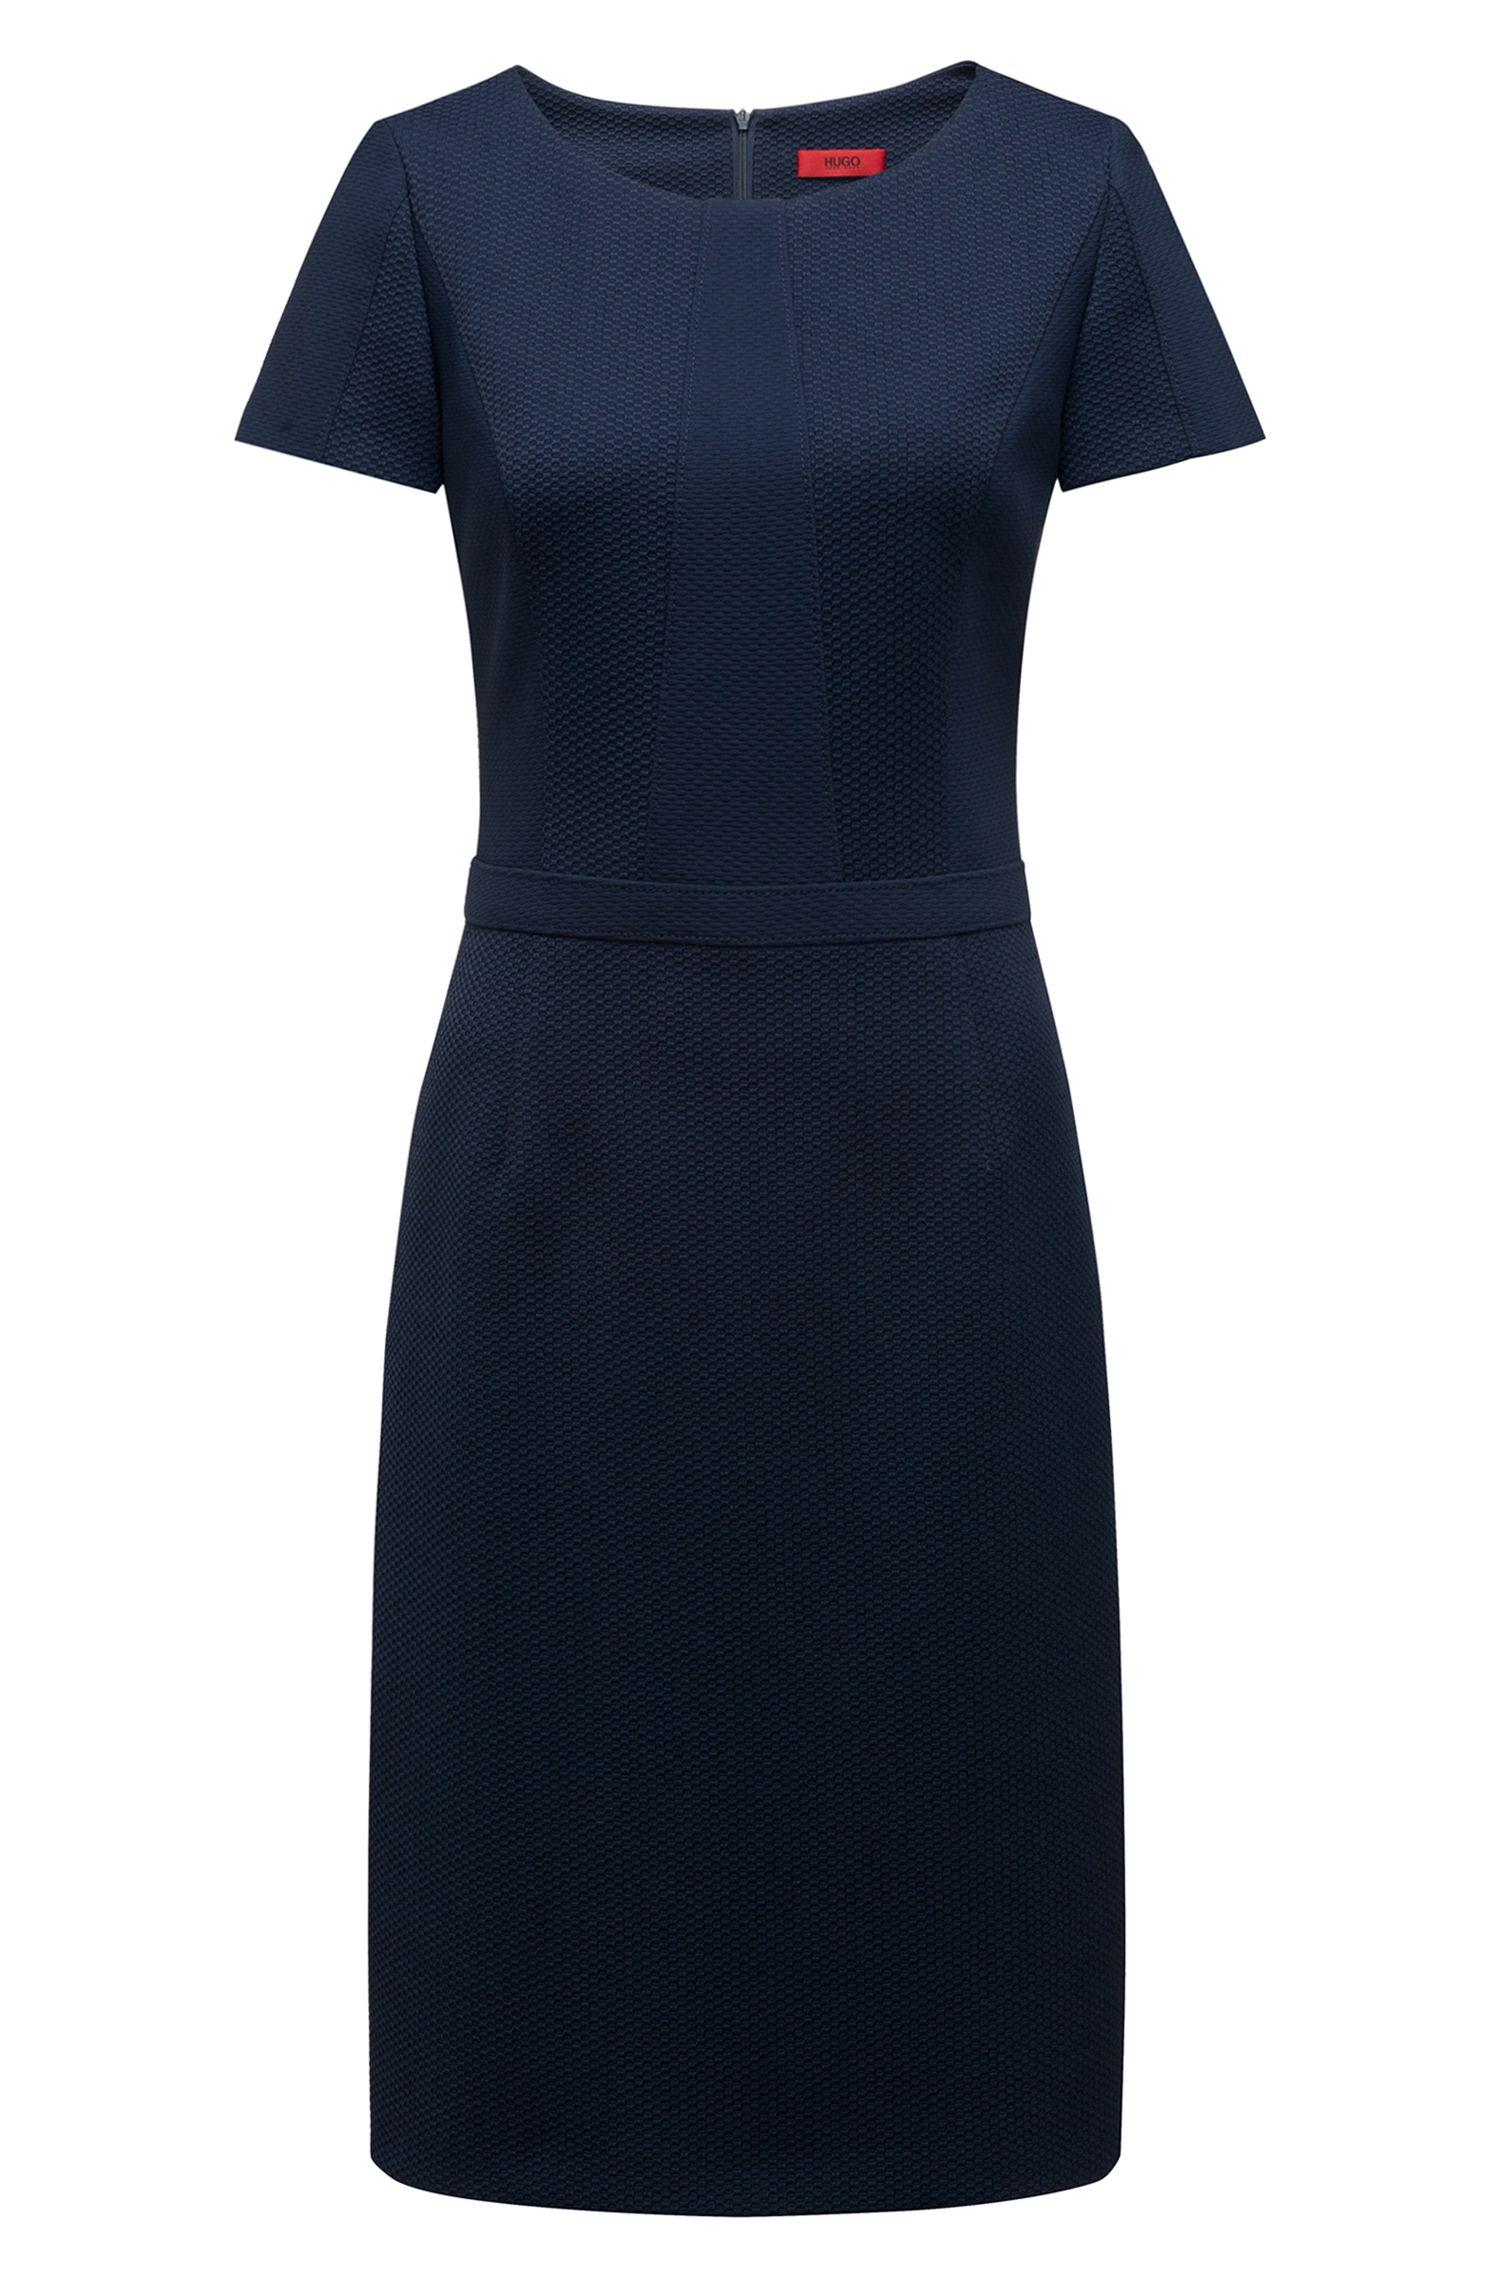 Vestido de manga corta en tejido elástico con paneles, Azul oscuro